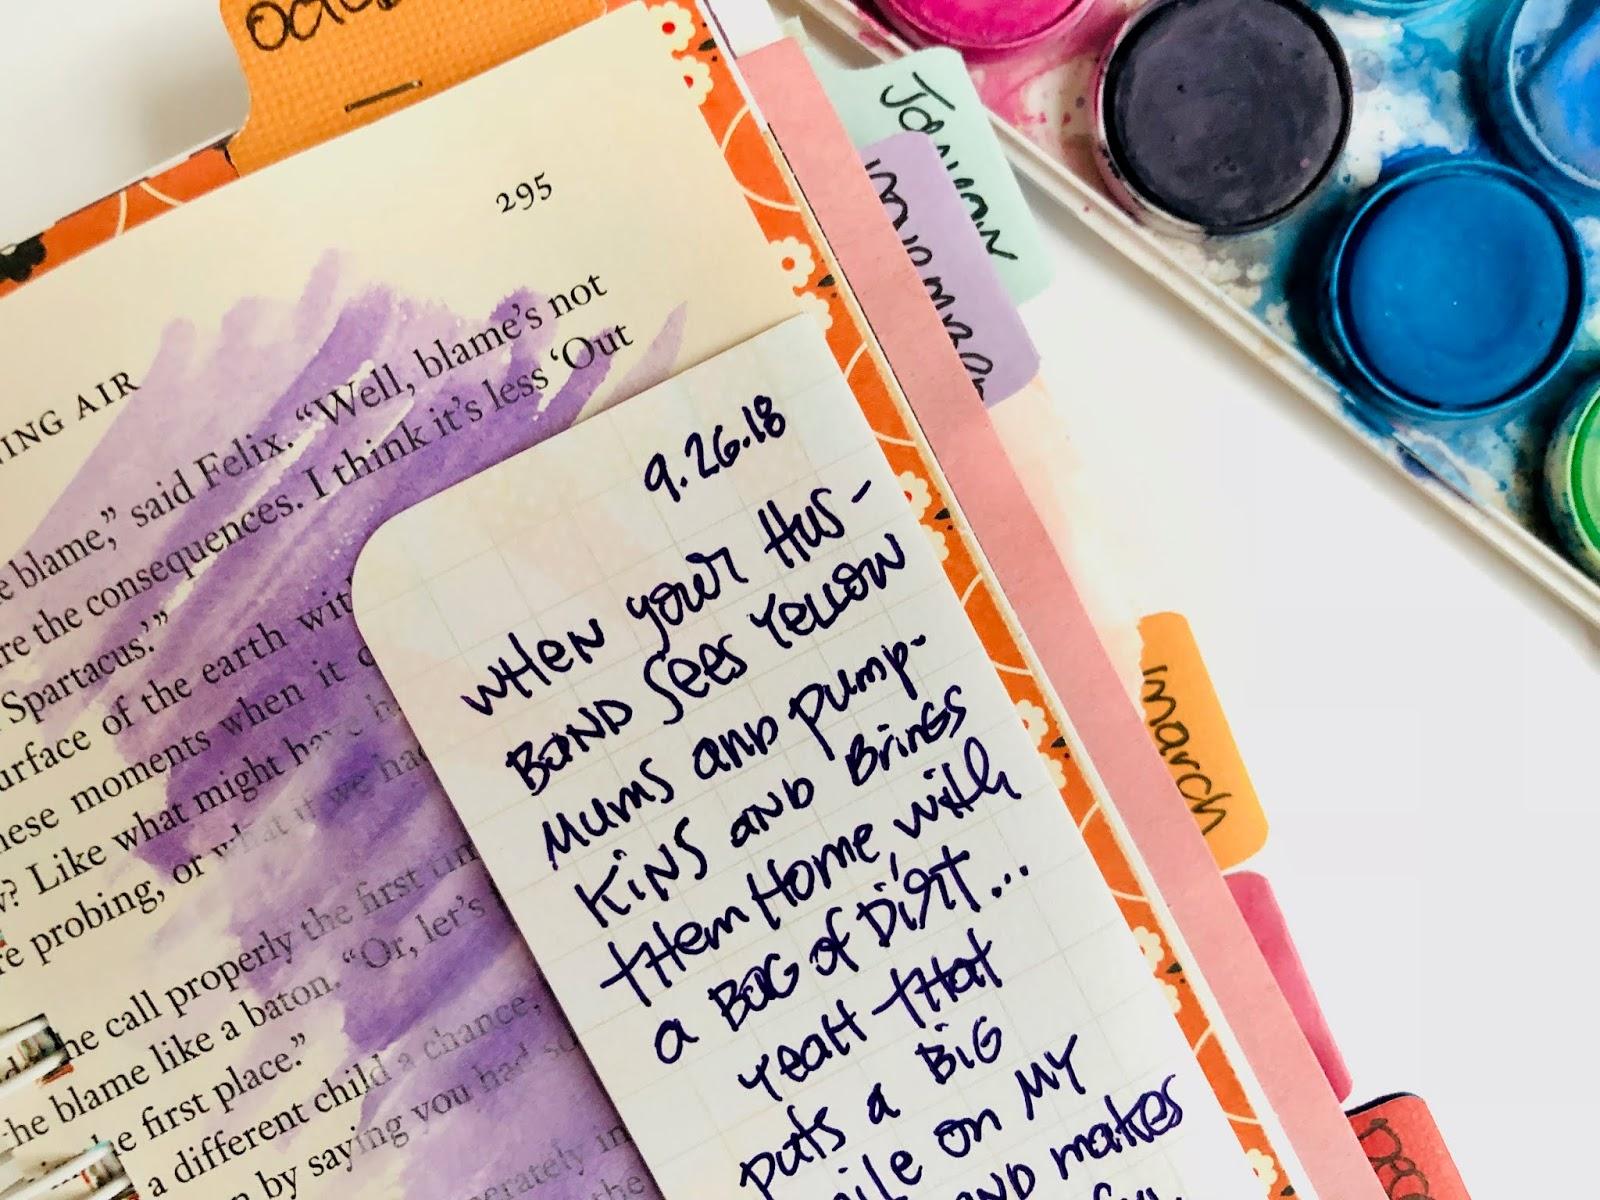 #gratitude journal #ilovethursdaythanks #grateful #gratitude #365 Things #Things I Am Grateful For #Journal #thankfulness #thankful